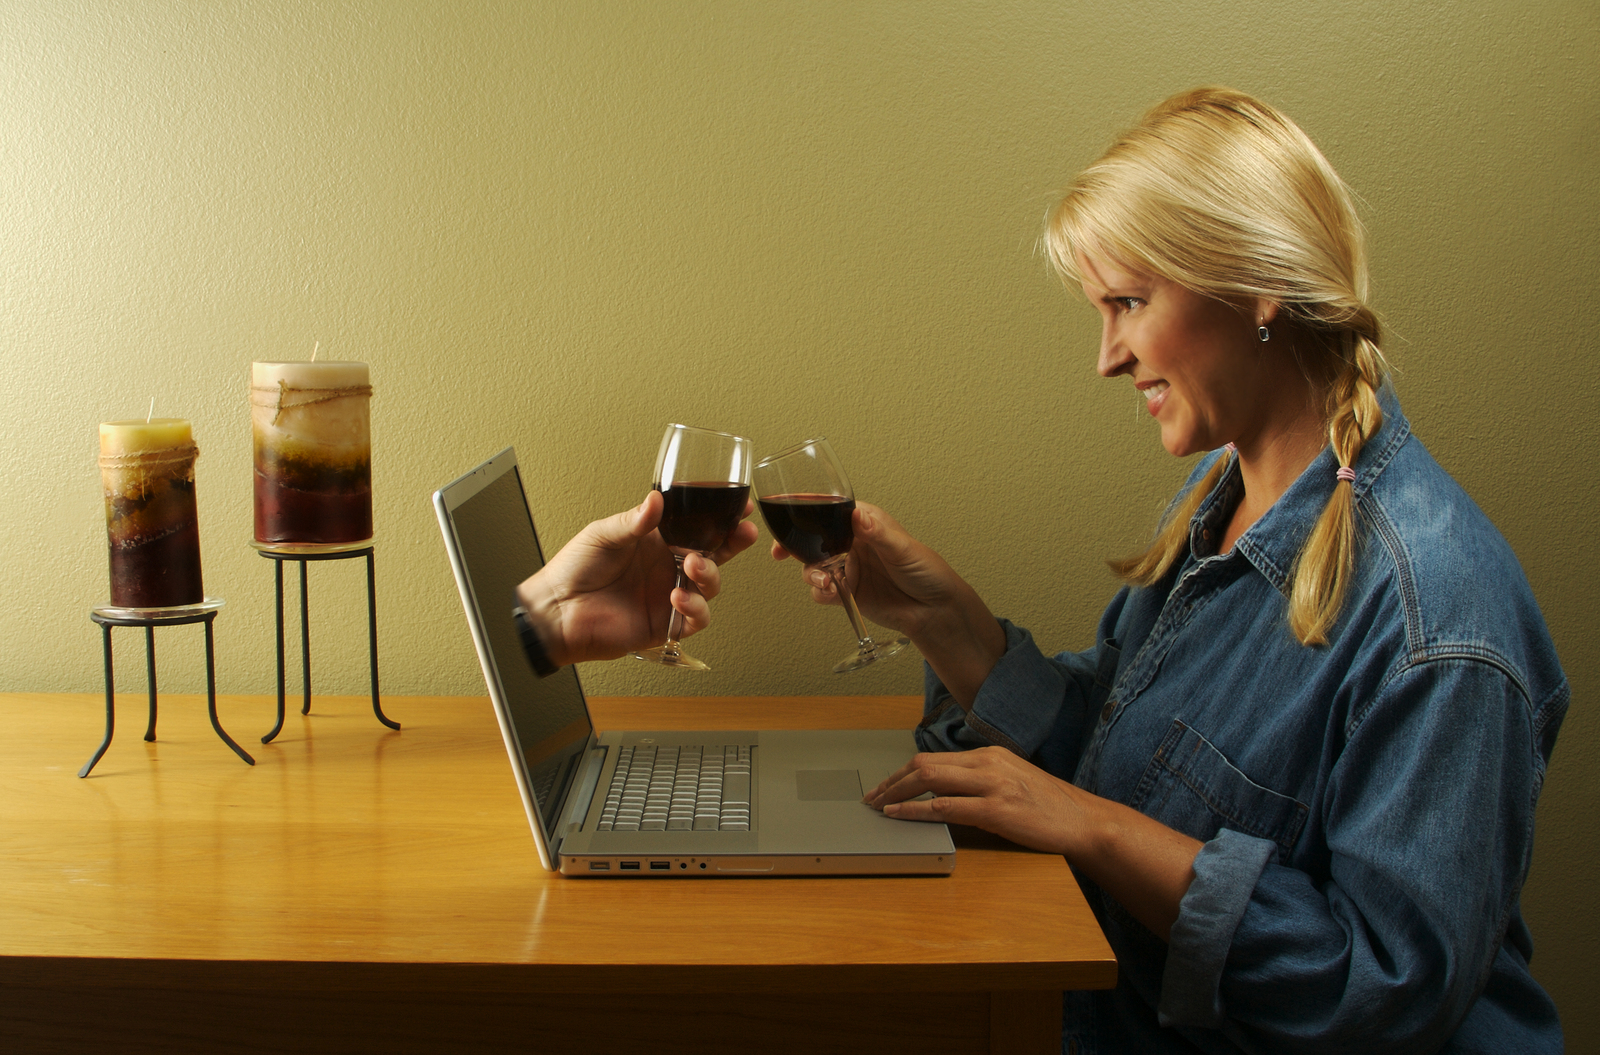 Your Behavior with Online Dating Partner for Start Affair